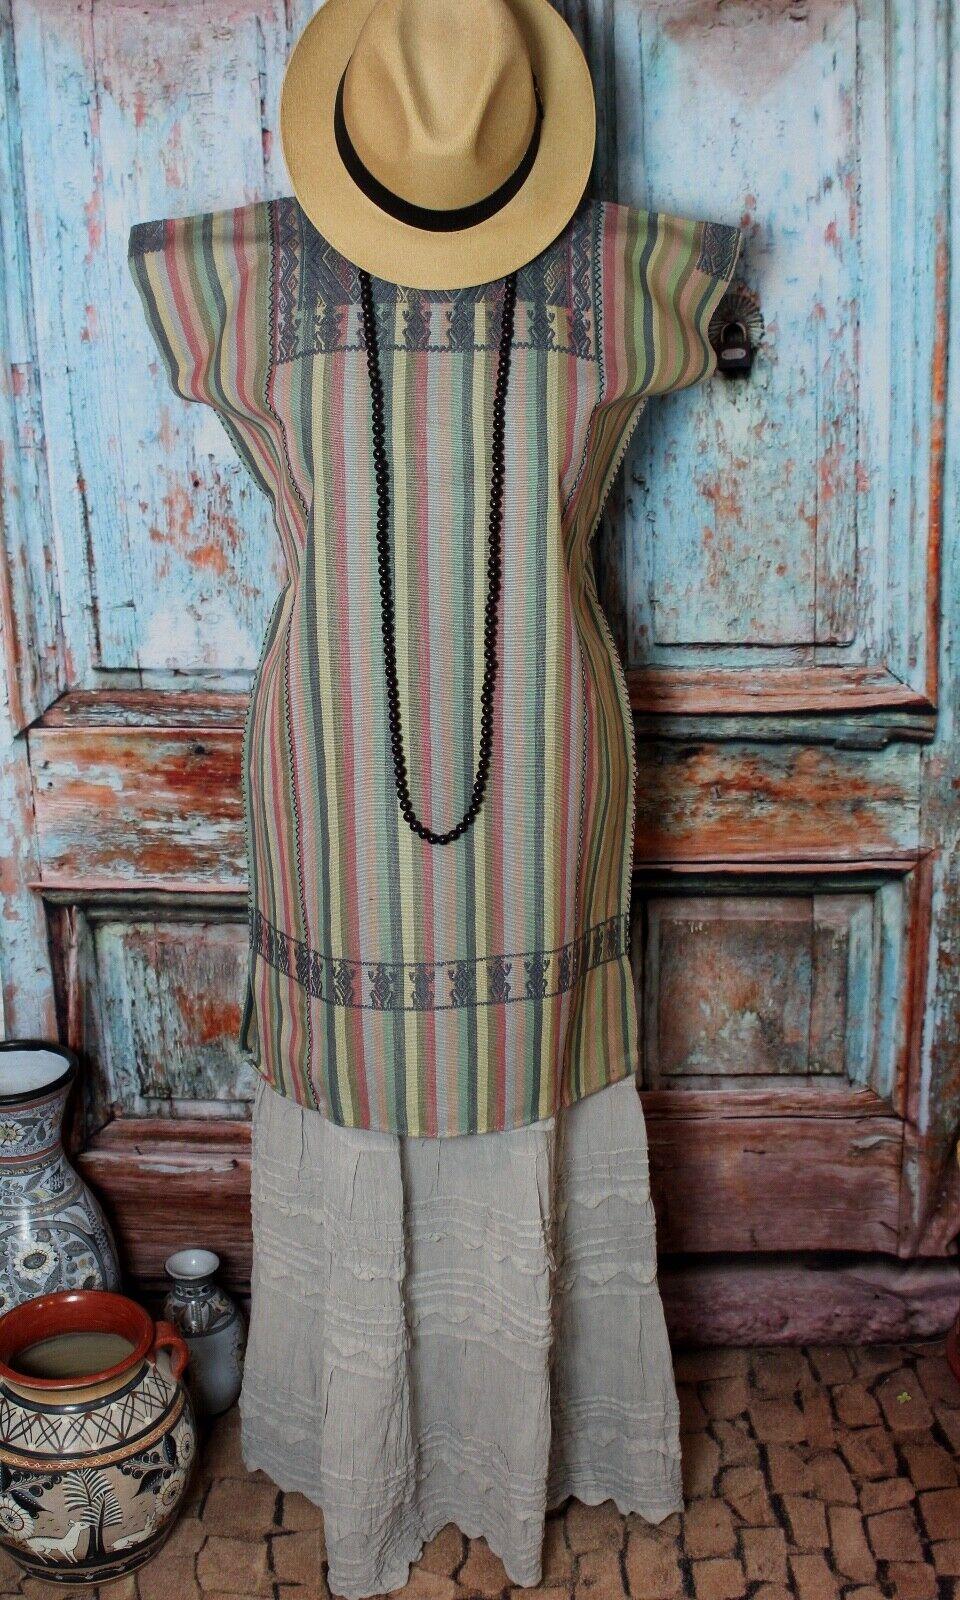 Huipil Short Dress Handwoven Gray & Earth Tones Larrainzar Mayan Chiapas Mexico